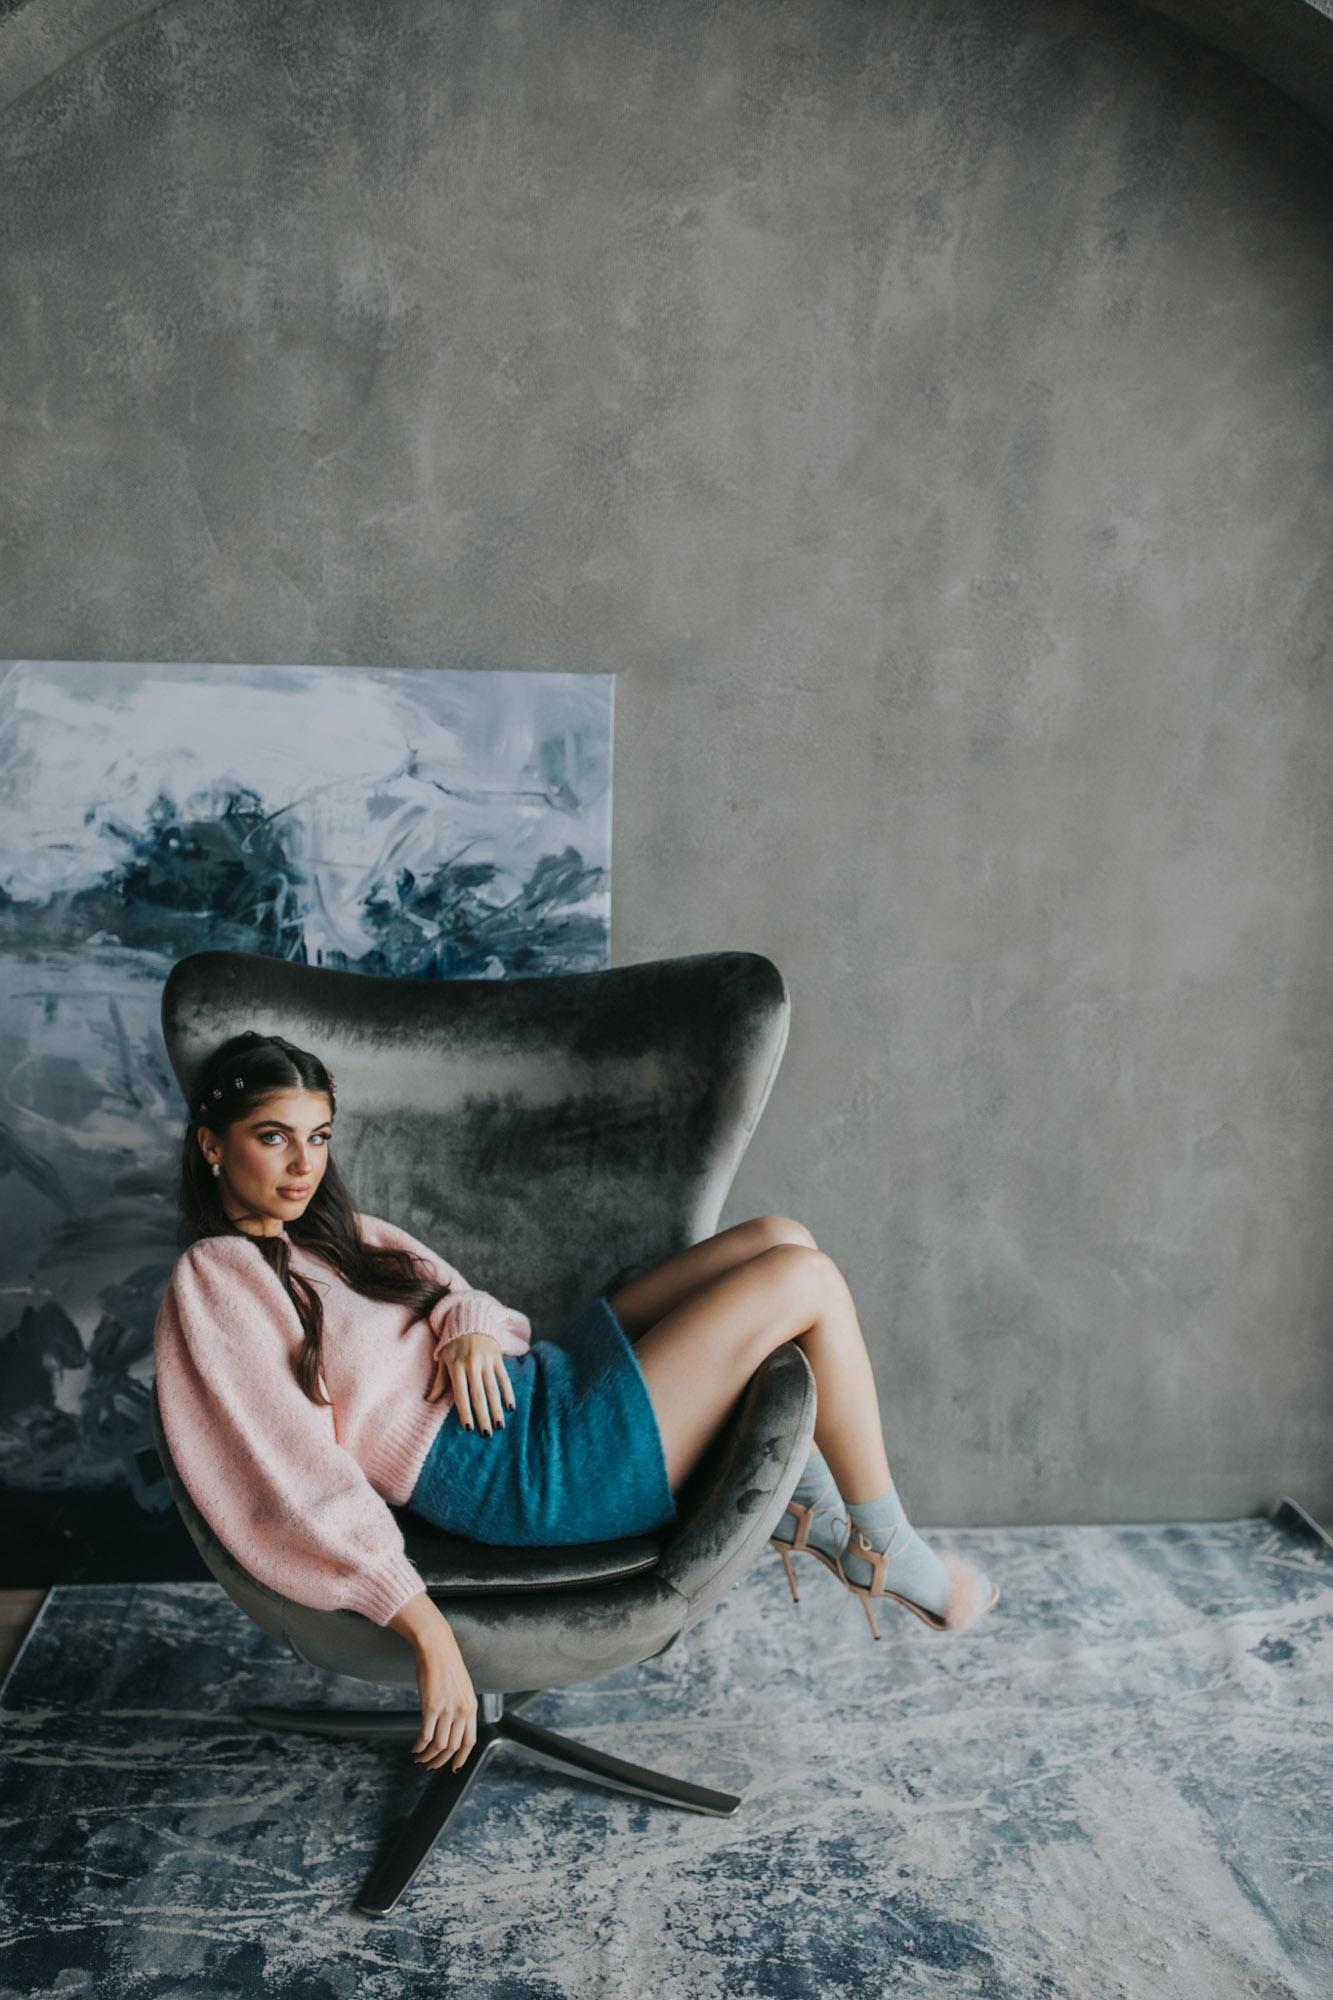 Estelle Shoot by August Media